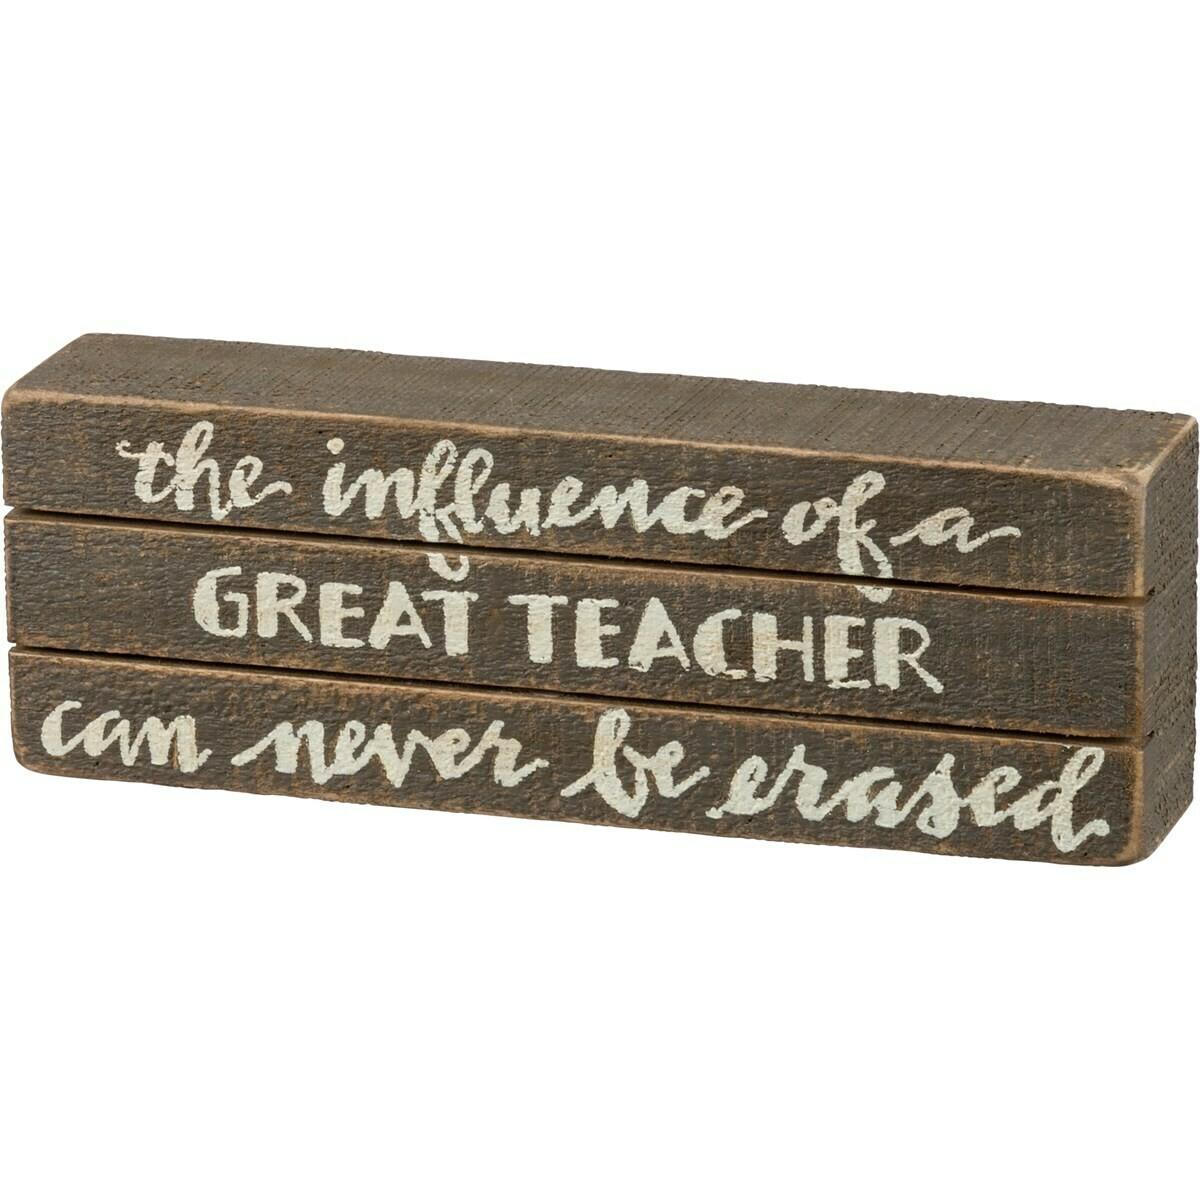 Great Teacher Skat Box Sign